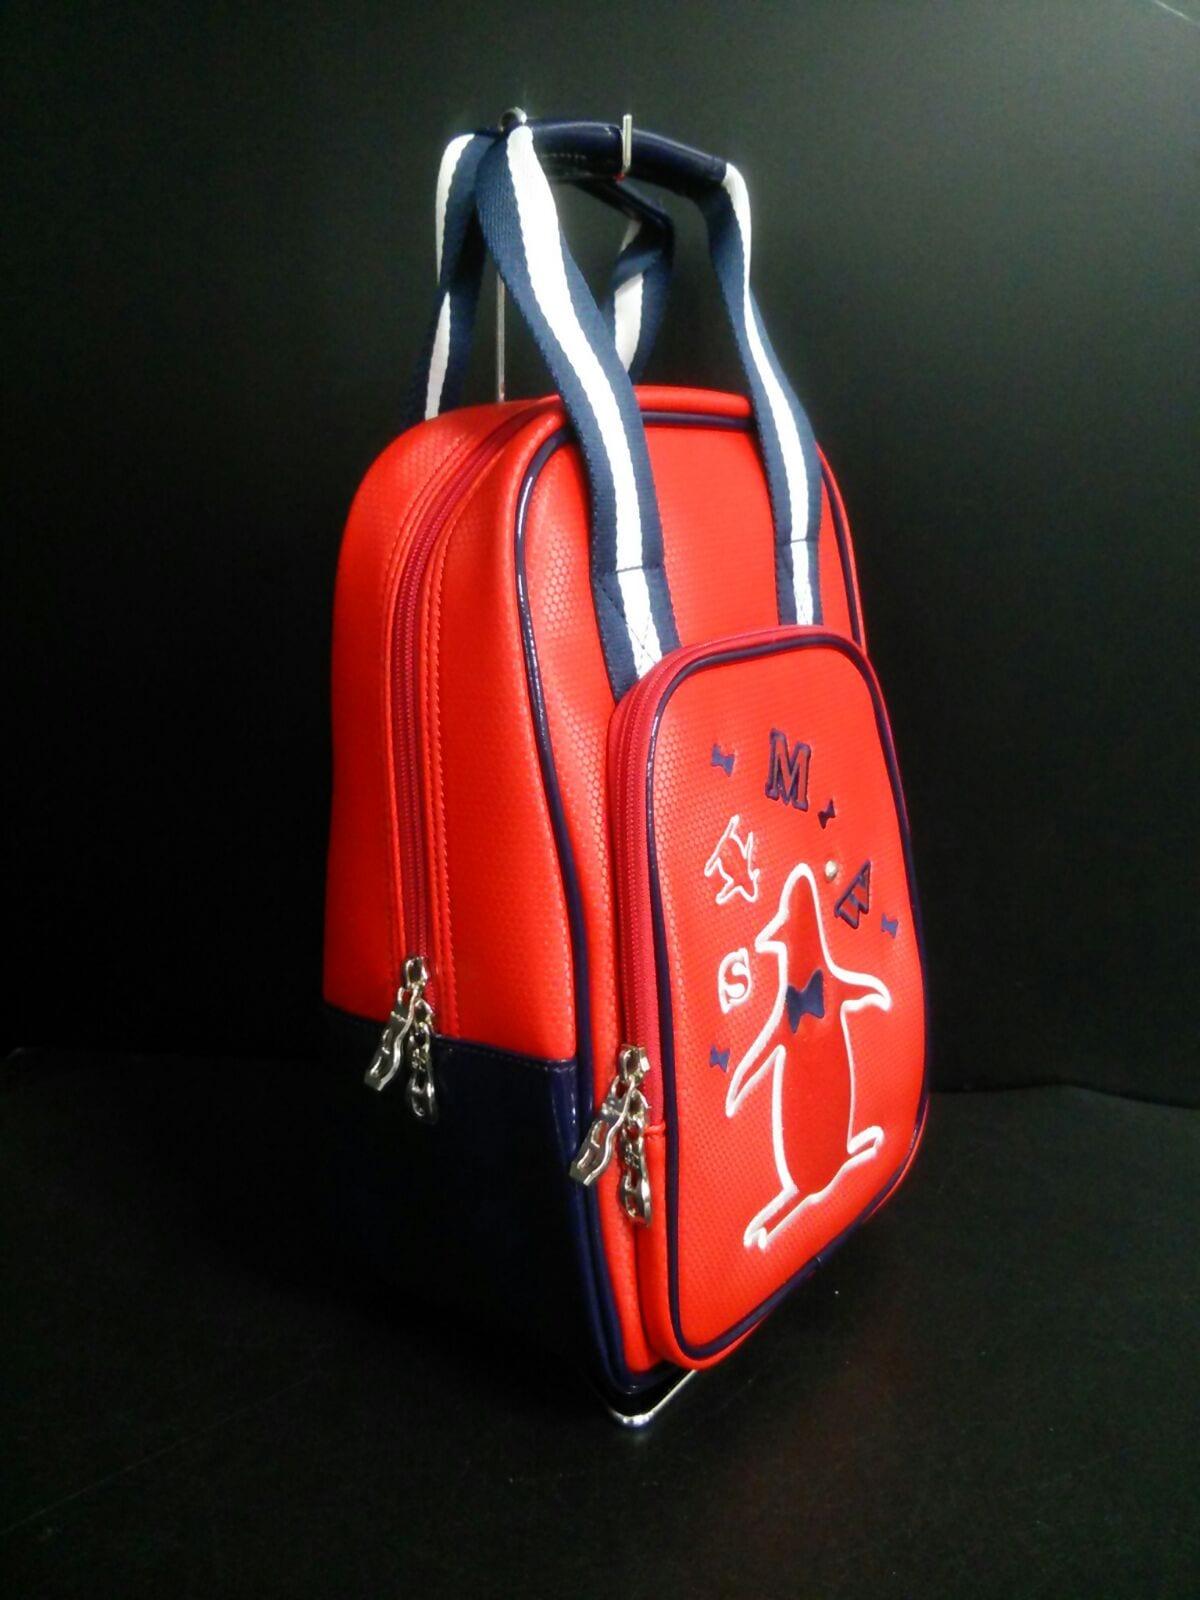 Munsingwear(マンシングウェア)のその他バッグ